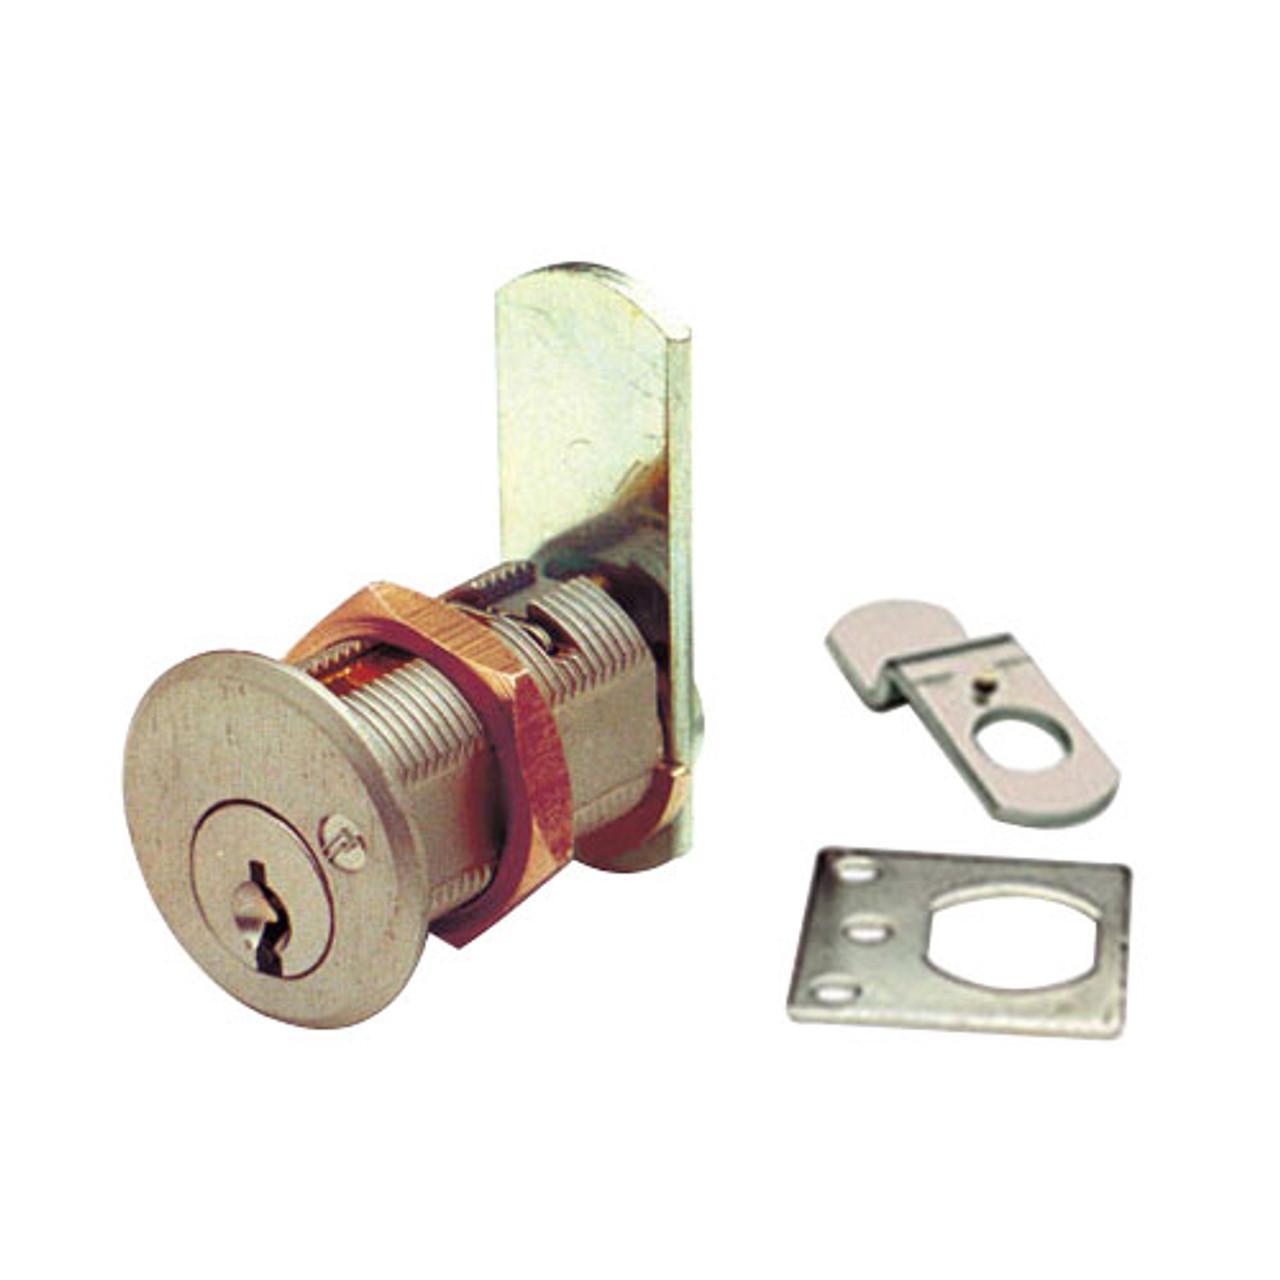 Olympus DCR2-KD-US3 Cam Locks in Bright Brass Finish